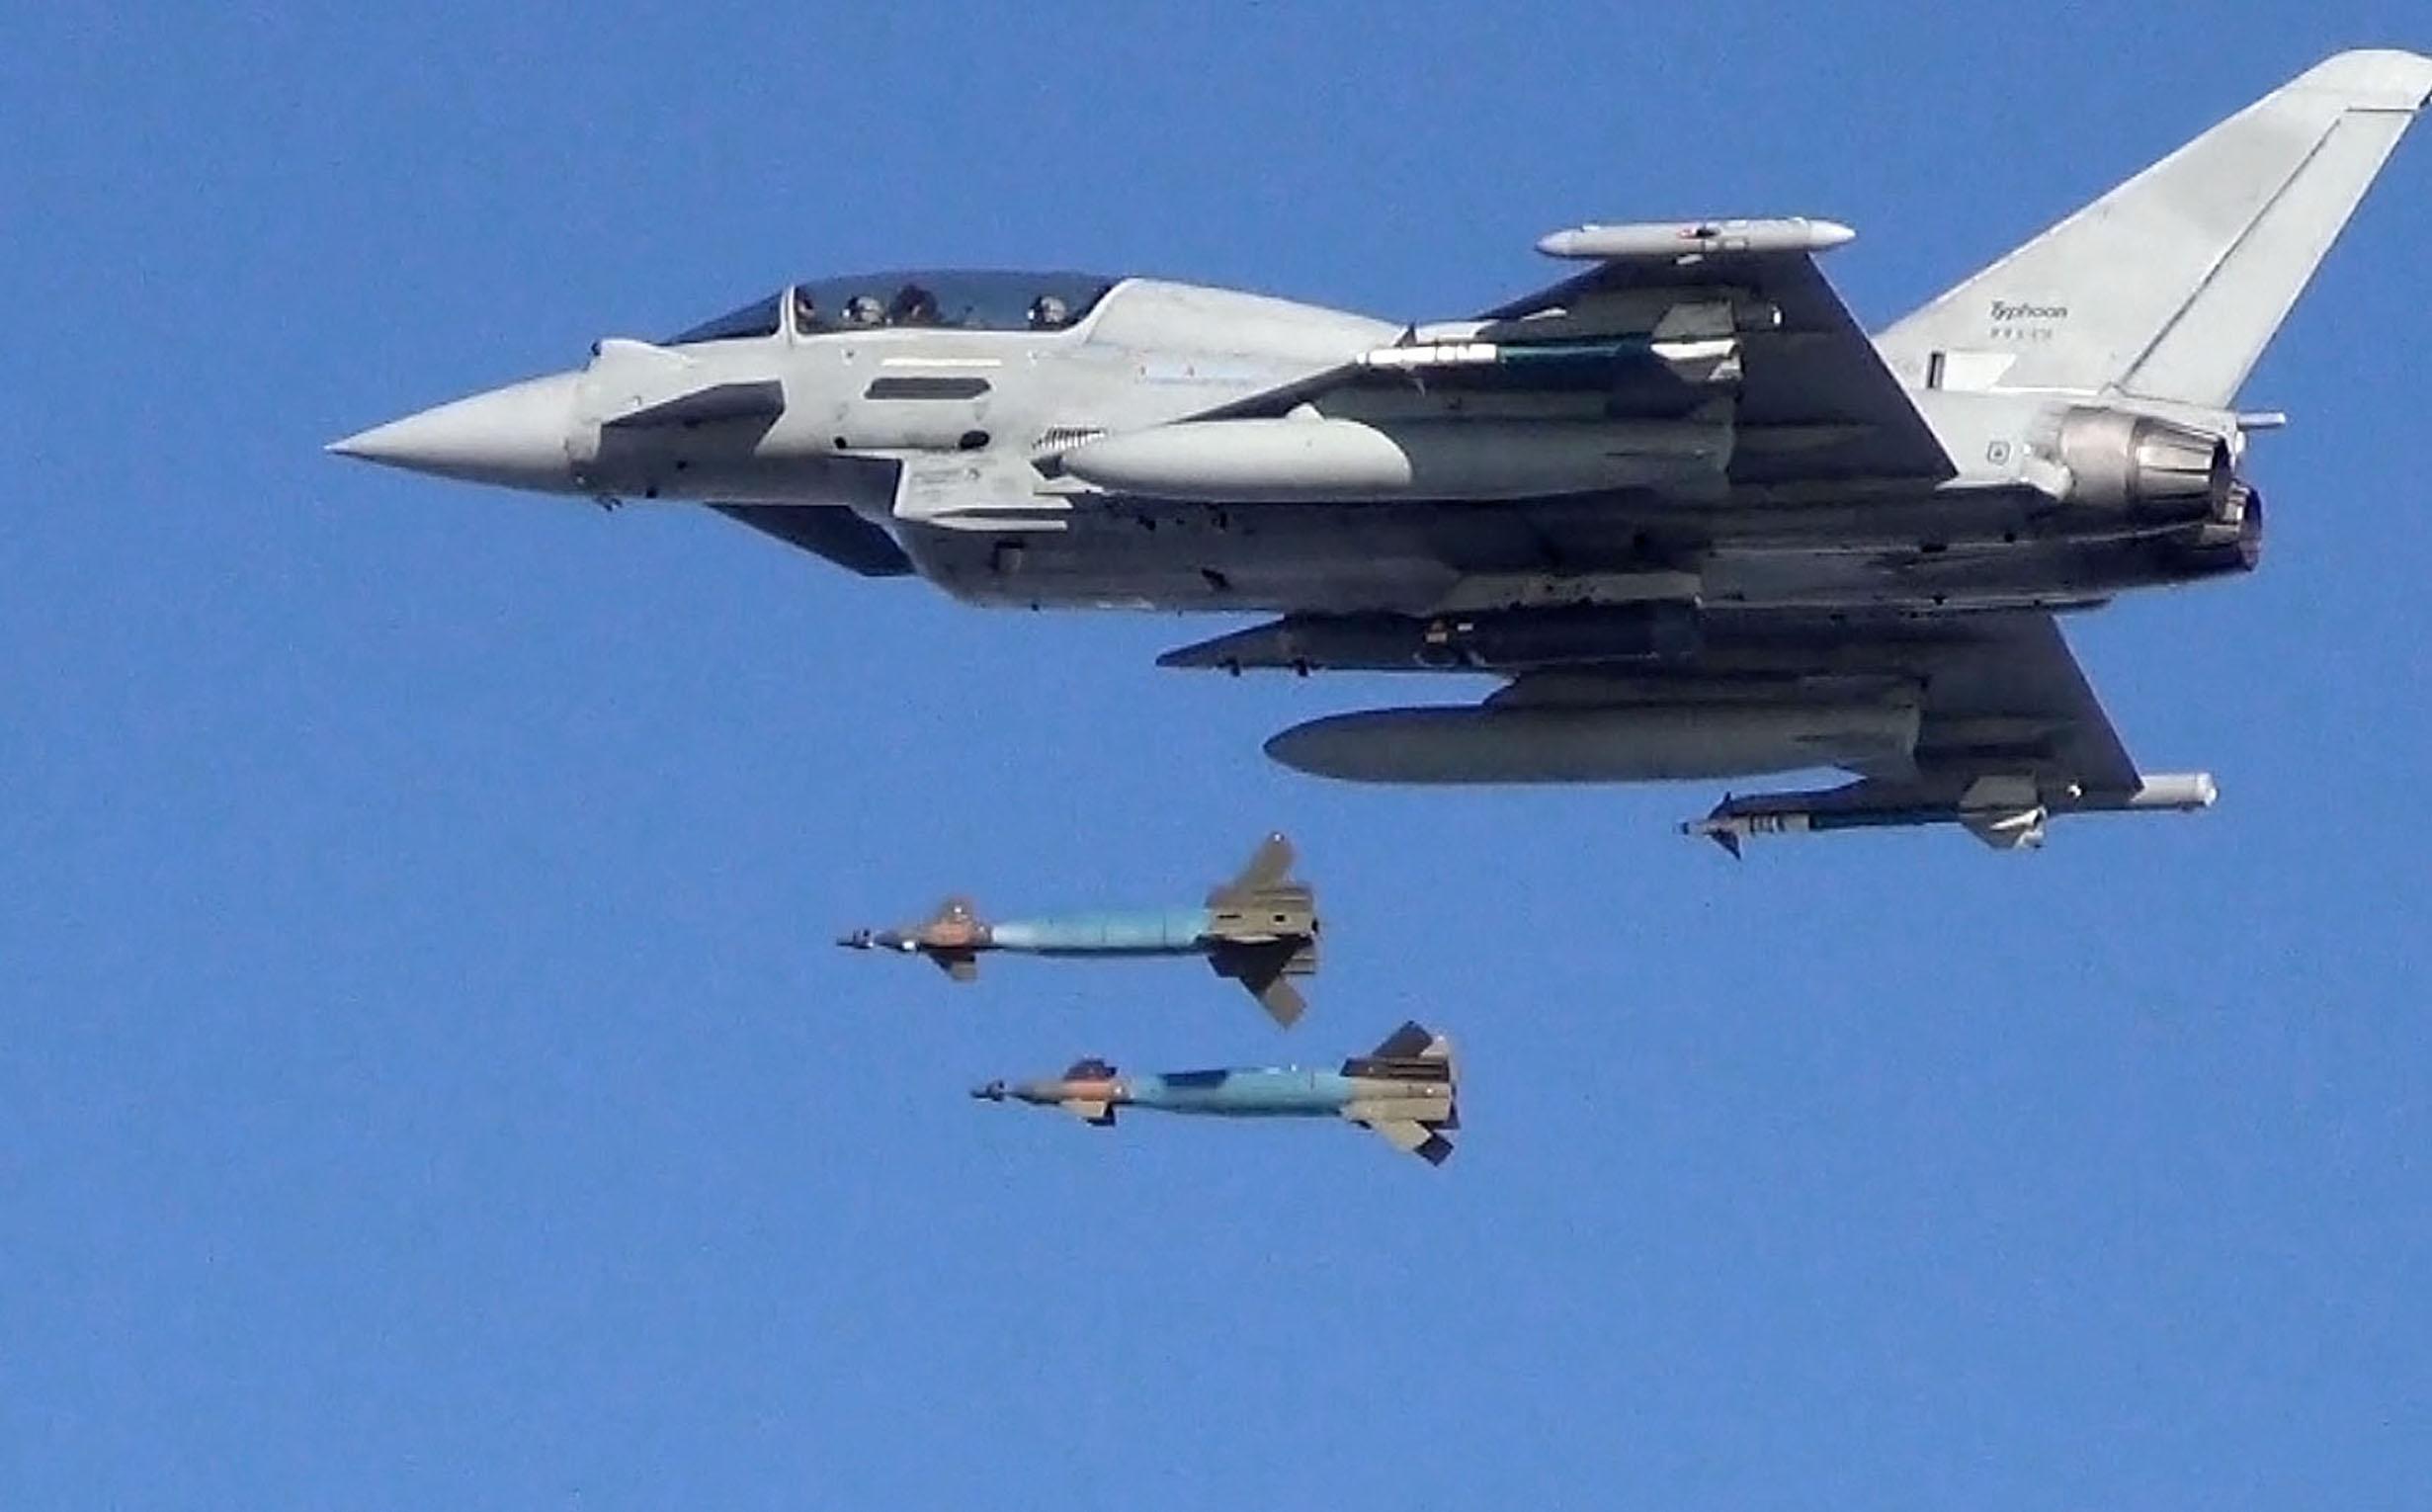 Emports, armements, équipements - Page 5 Typhoon-dual-bomb-drop